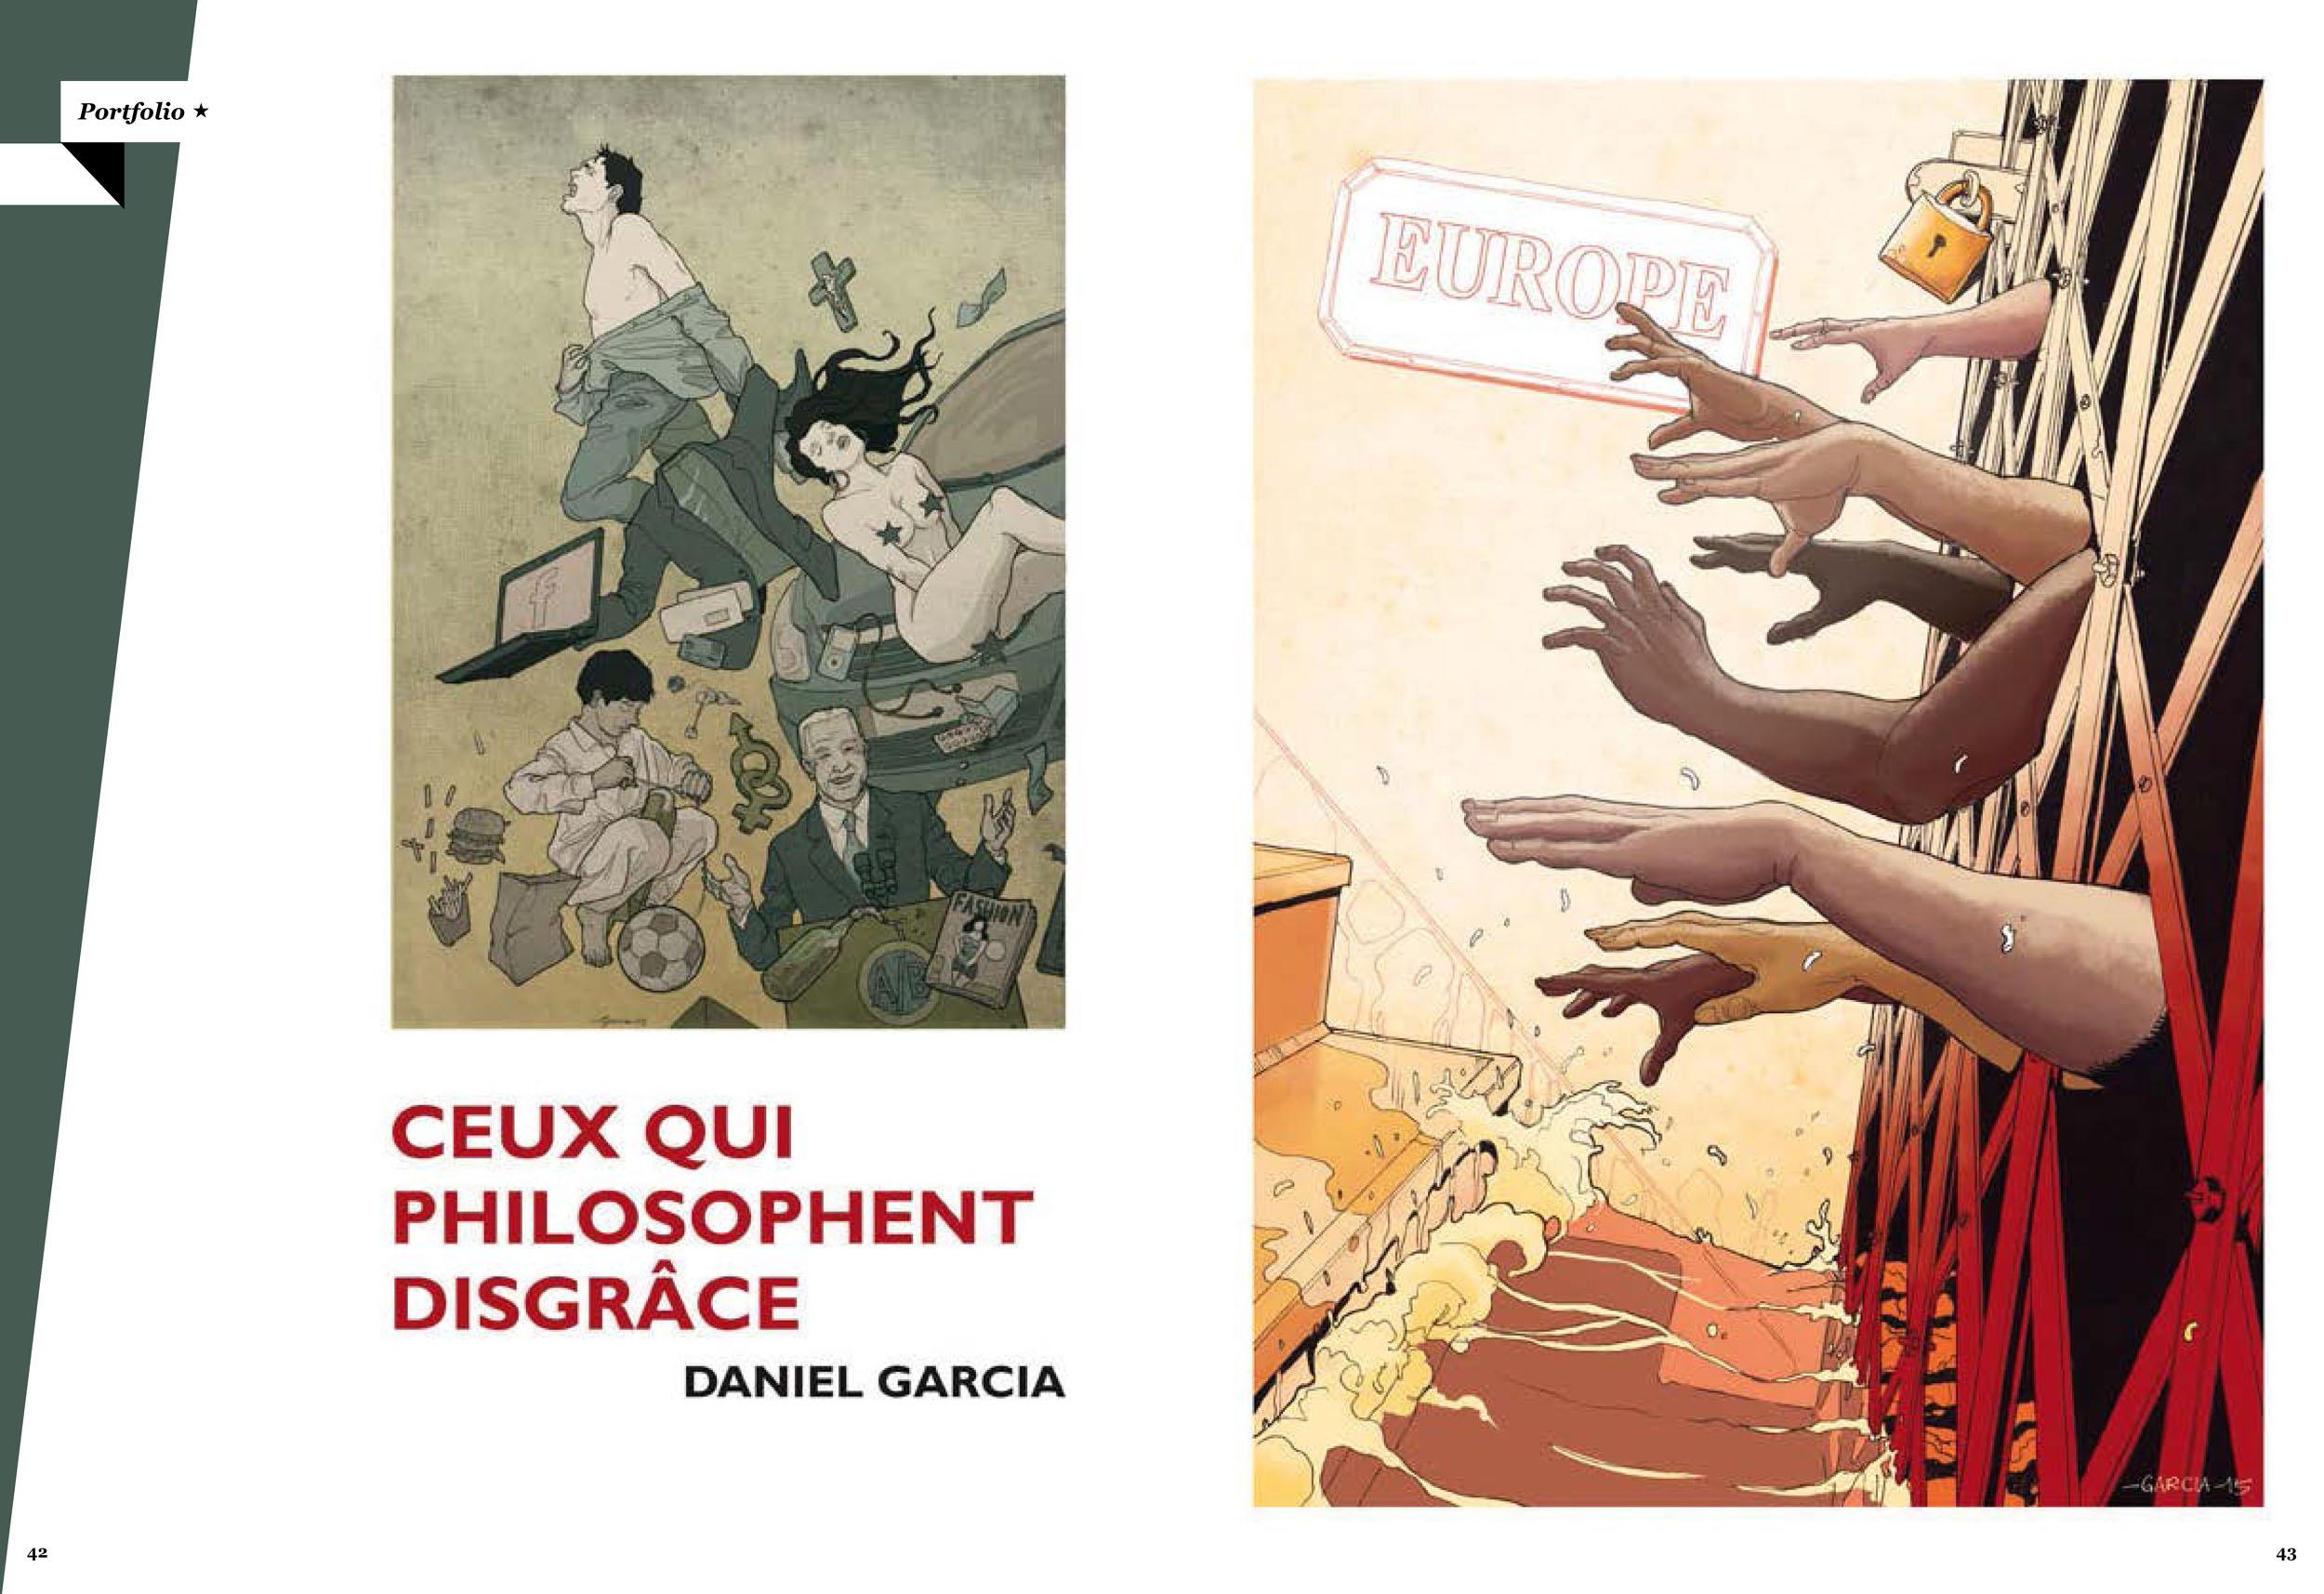 Daniel Garcia Art Illustration Portfolio Monde Libertaire 02